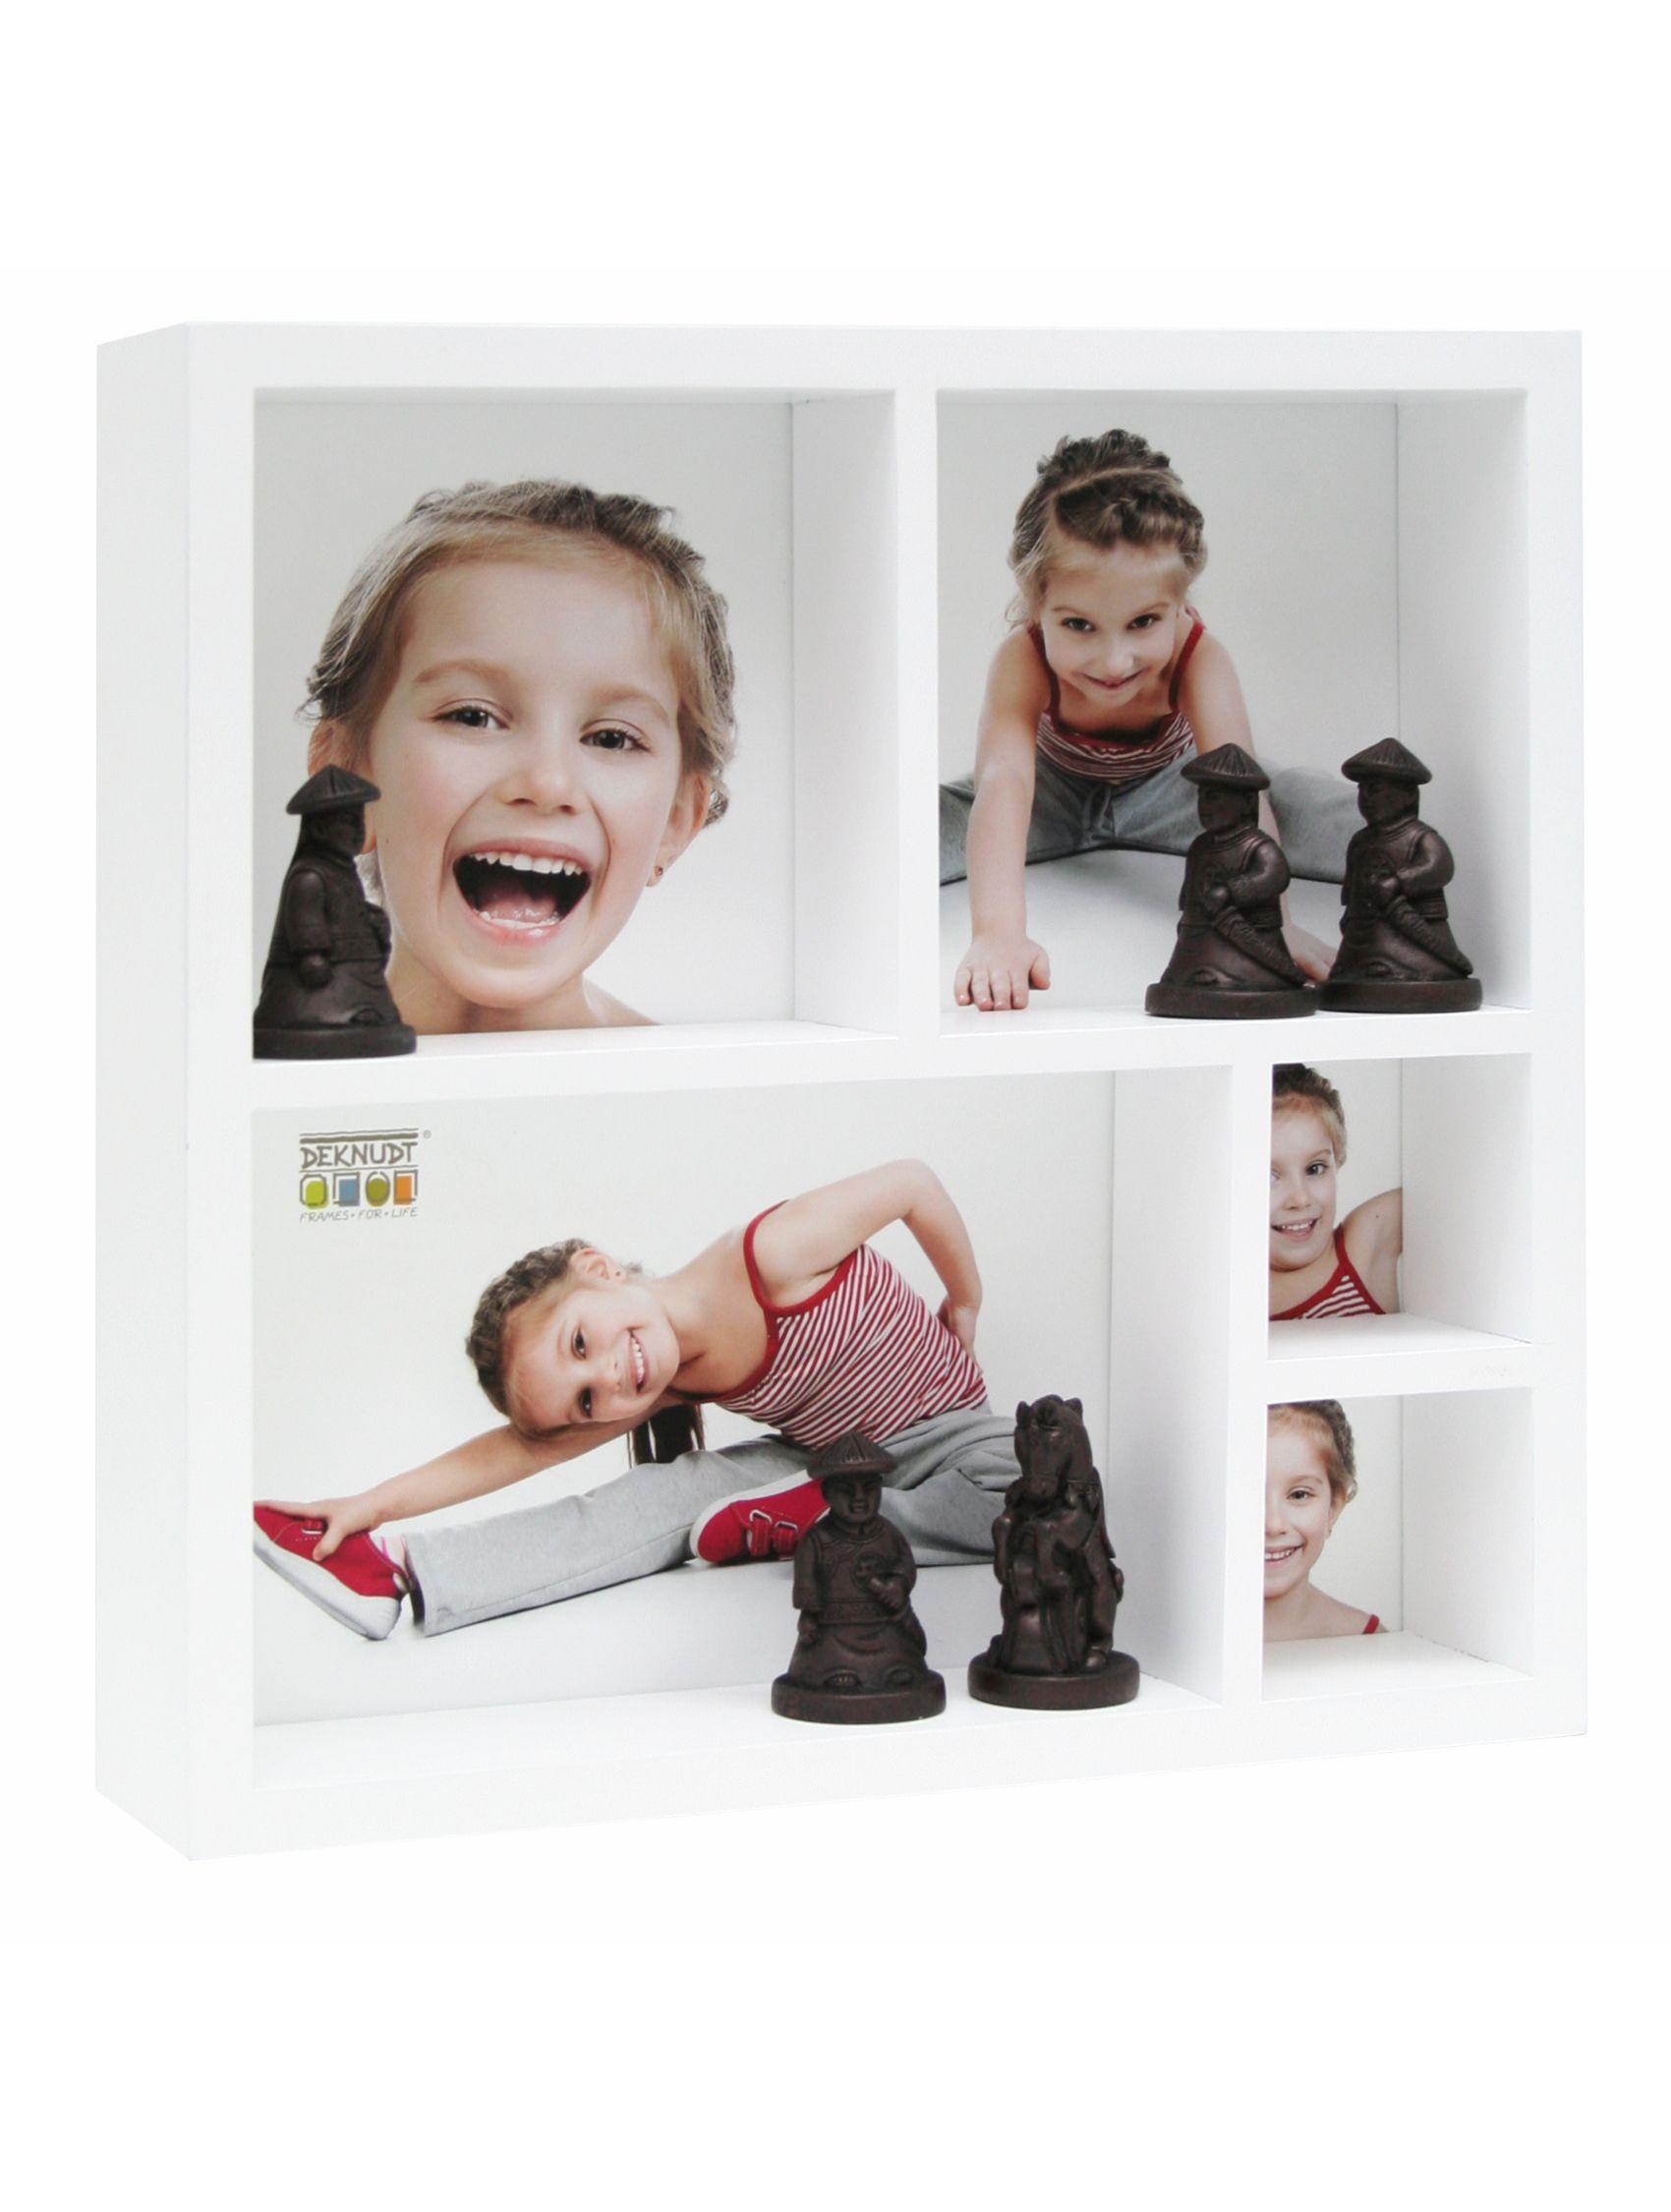 Foto-verzamelbox wit voor 5 foto's (20x20cm) S66XL1 E5